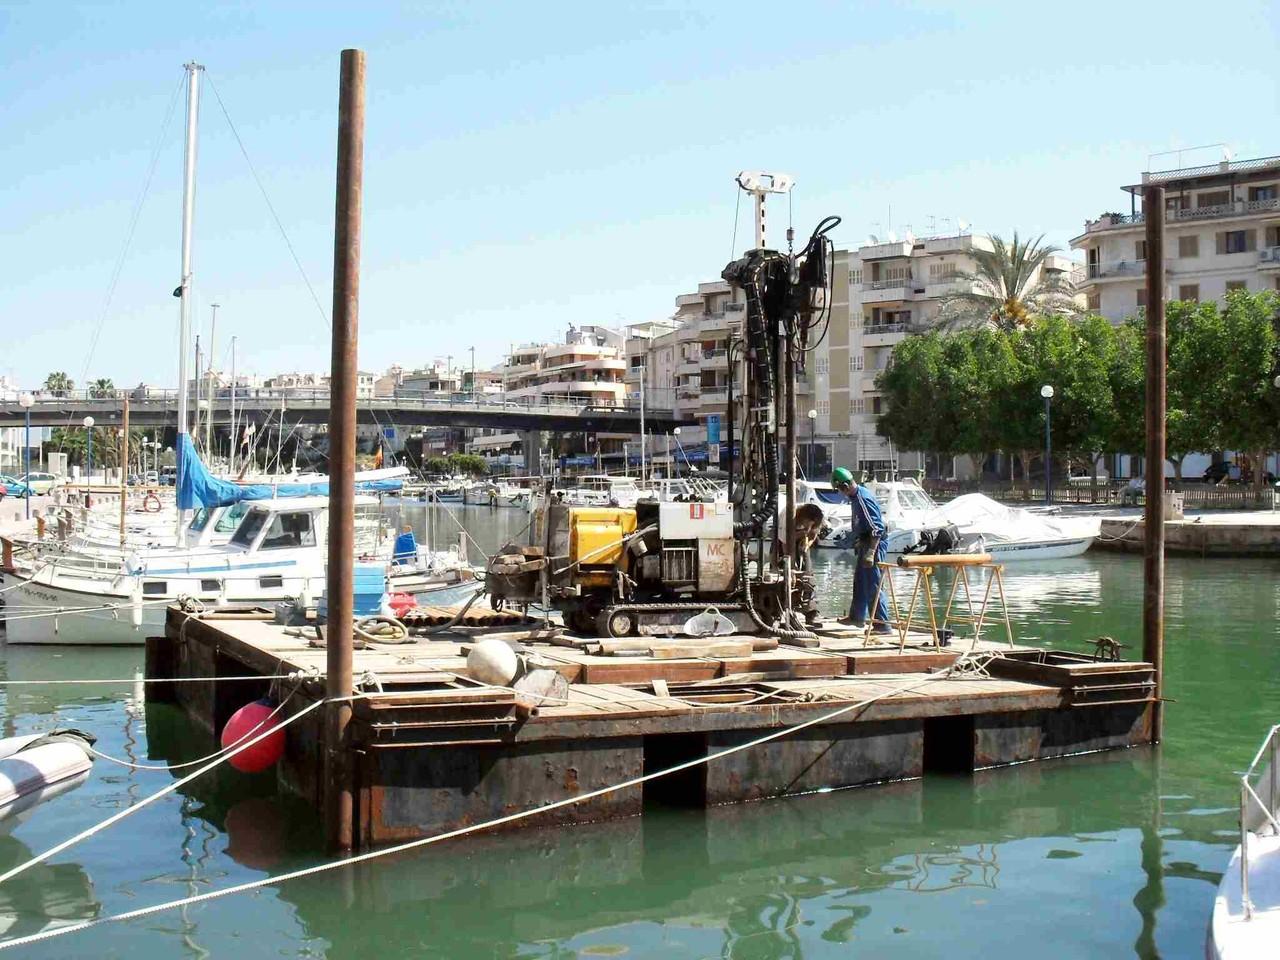 Sondeig damunt pontona. Port de Palma.